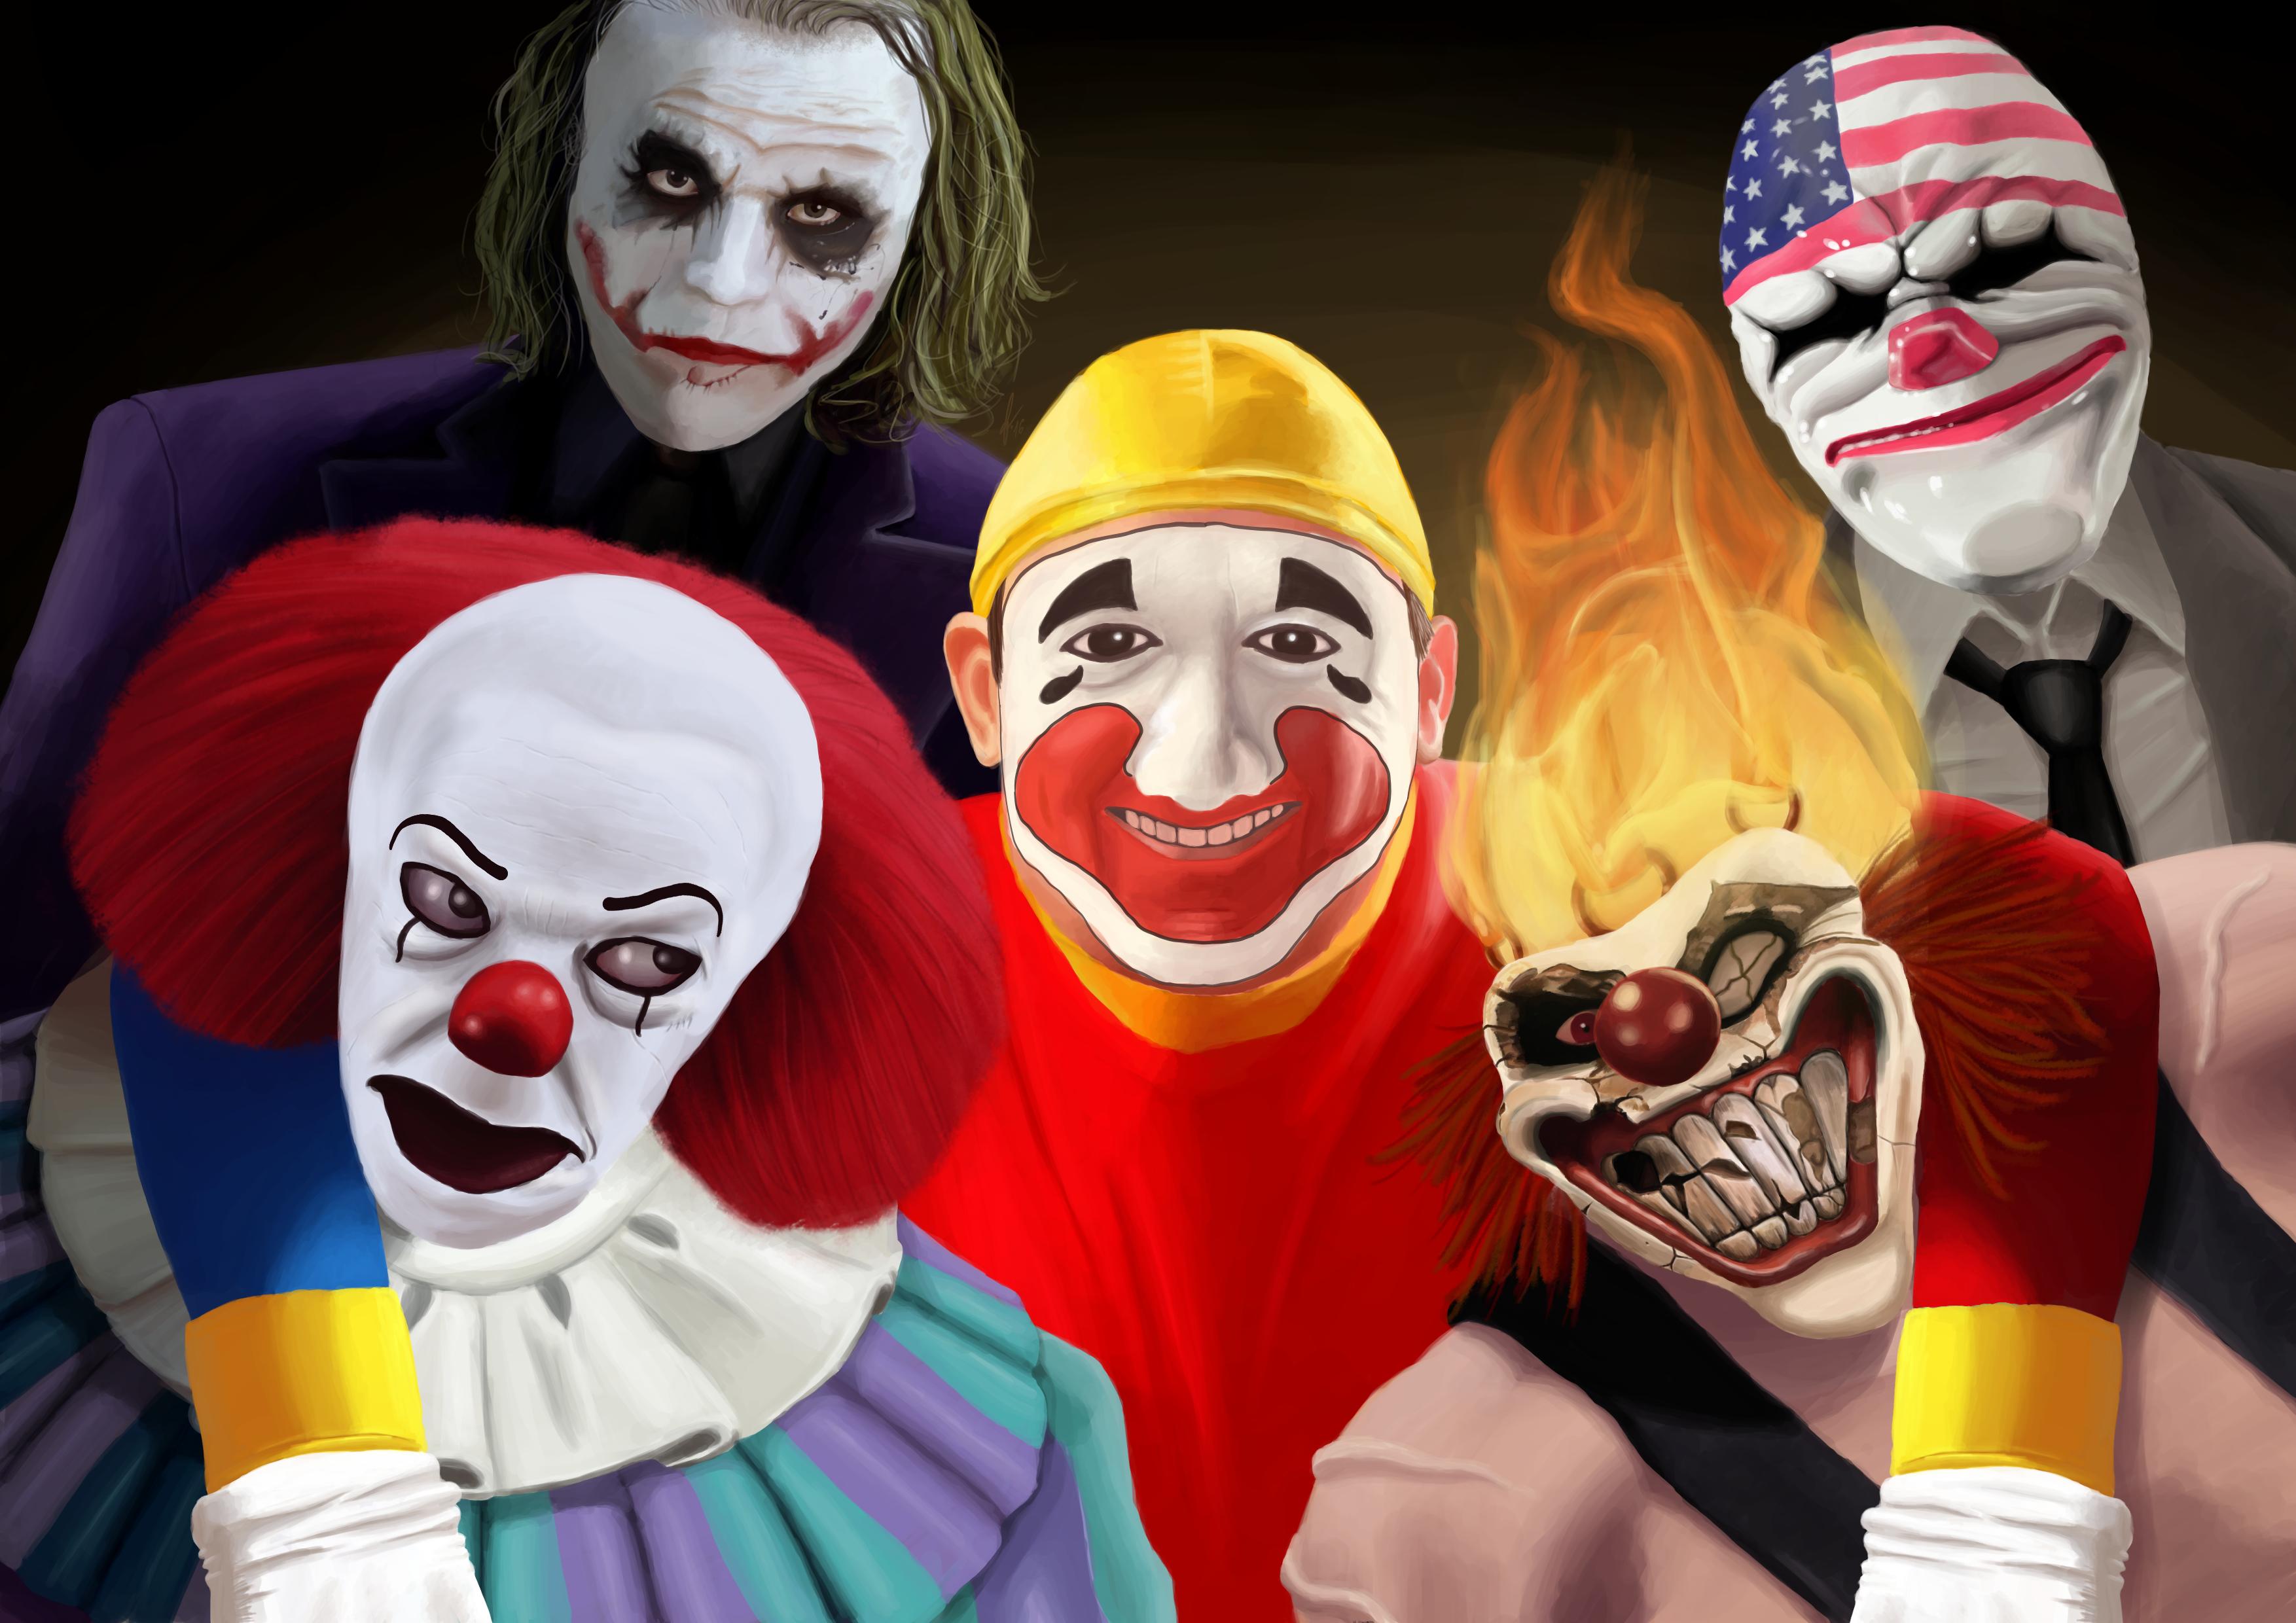 A bunch of psycho clowns